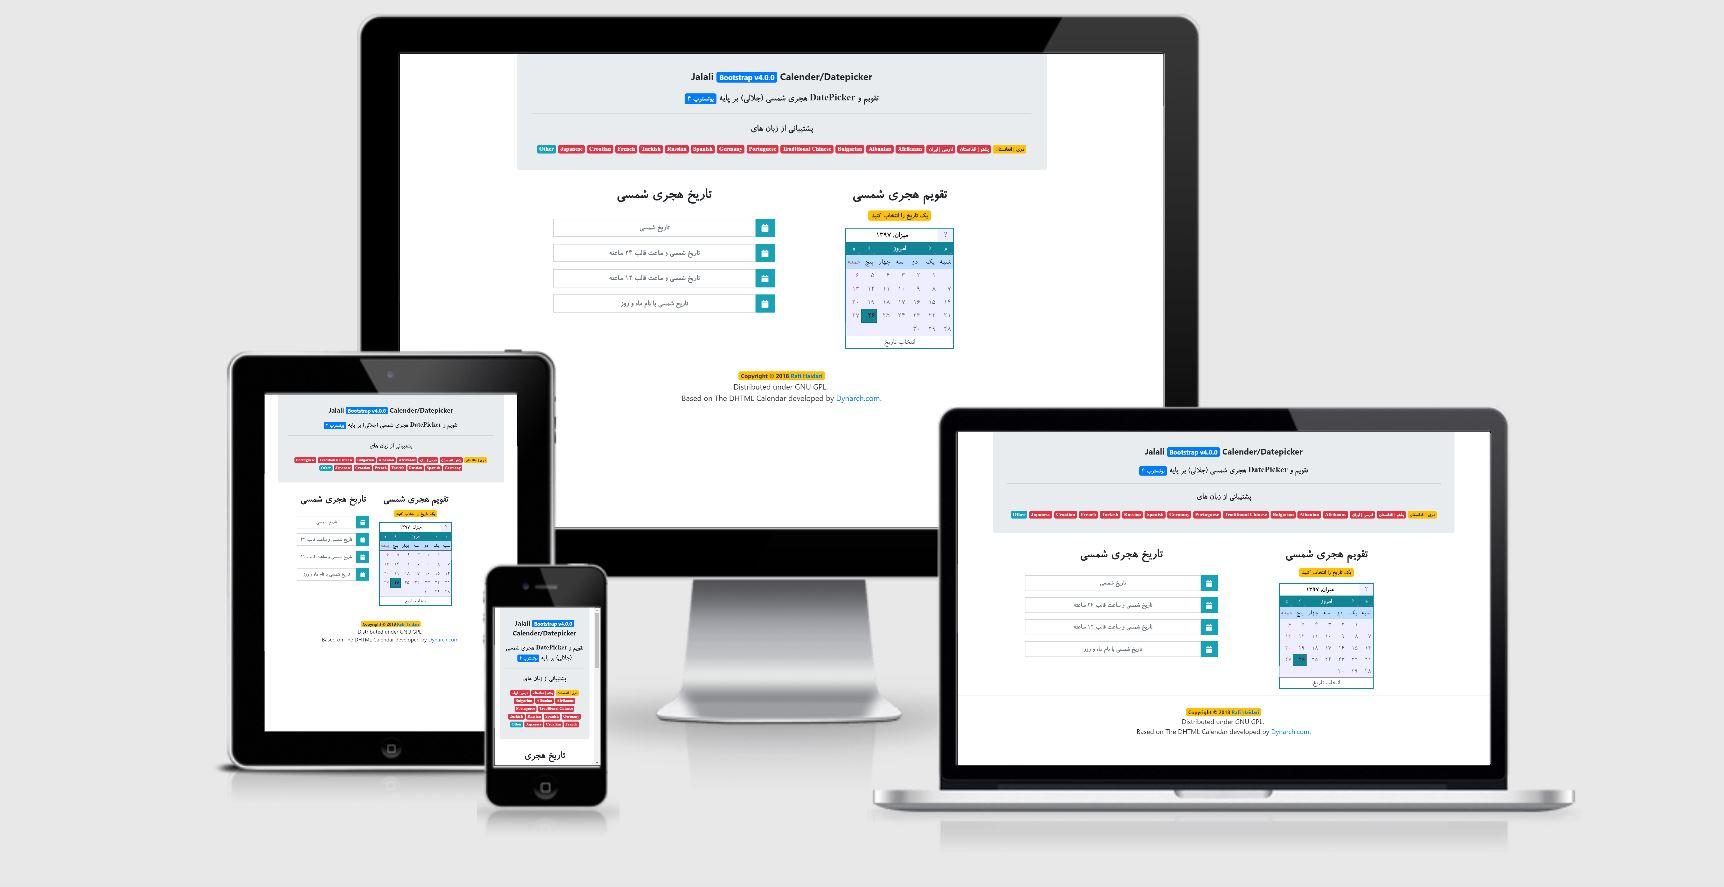 Jalali Bootstrap Calendar and Datepicker